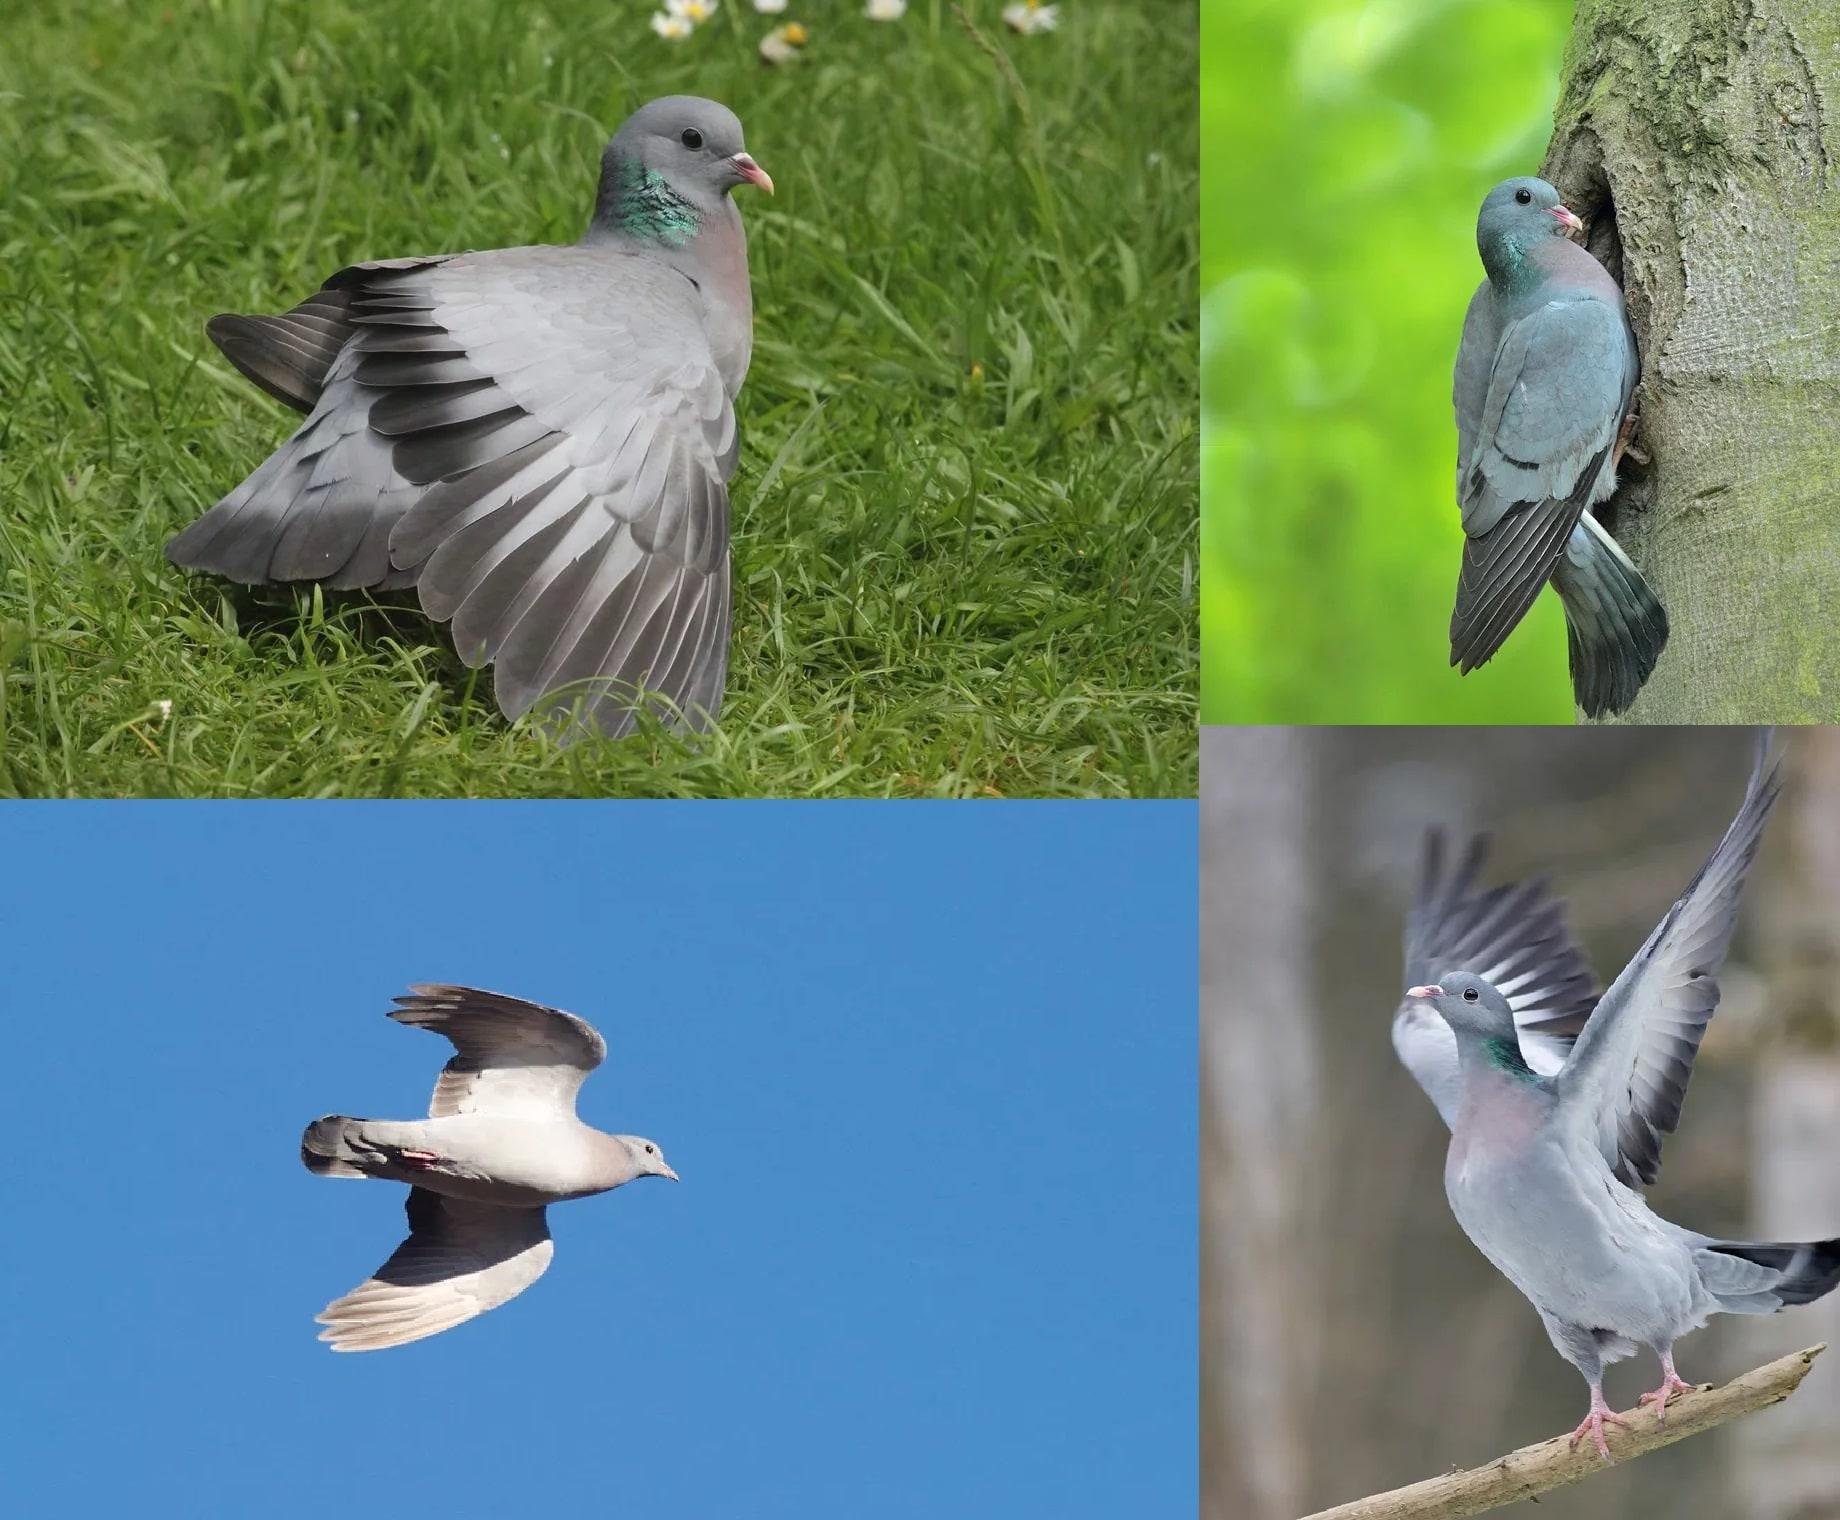 Клинтух. Коллаж из фотографий перелётной птицы